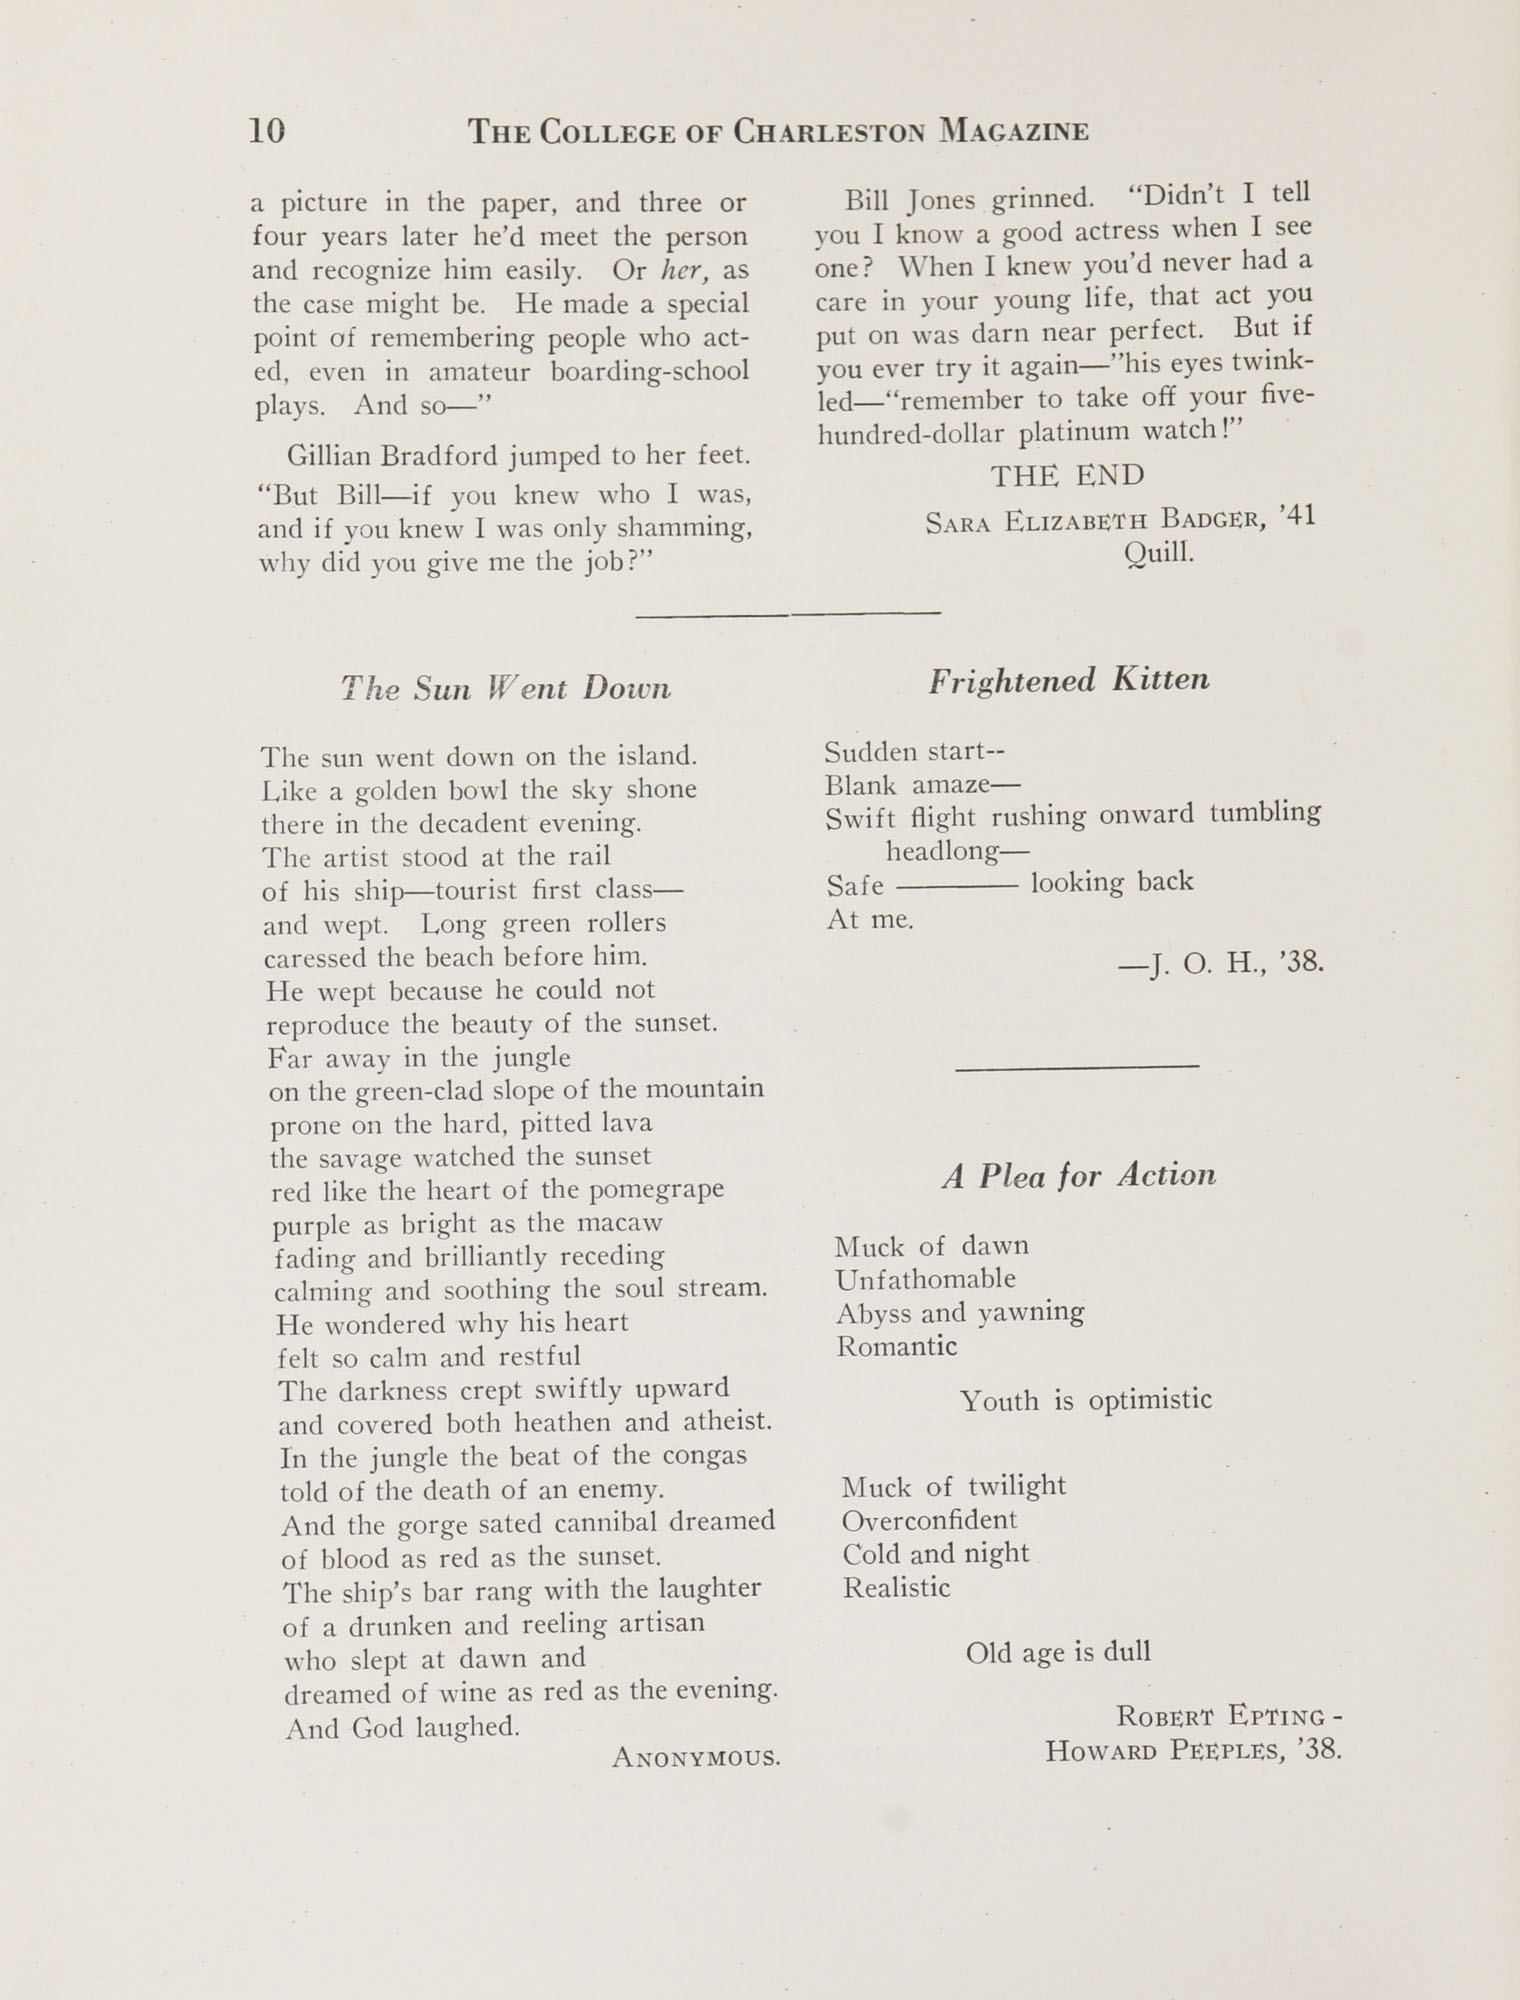 College of Charleston Magazine, 1937-1938, Vol. XXXXI No. 1, page 10